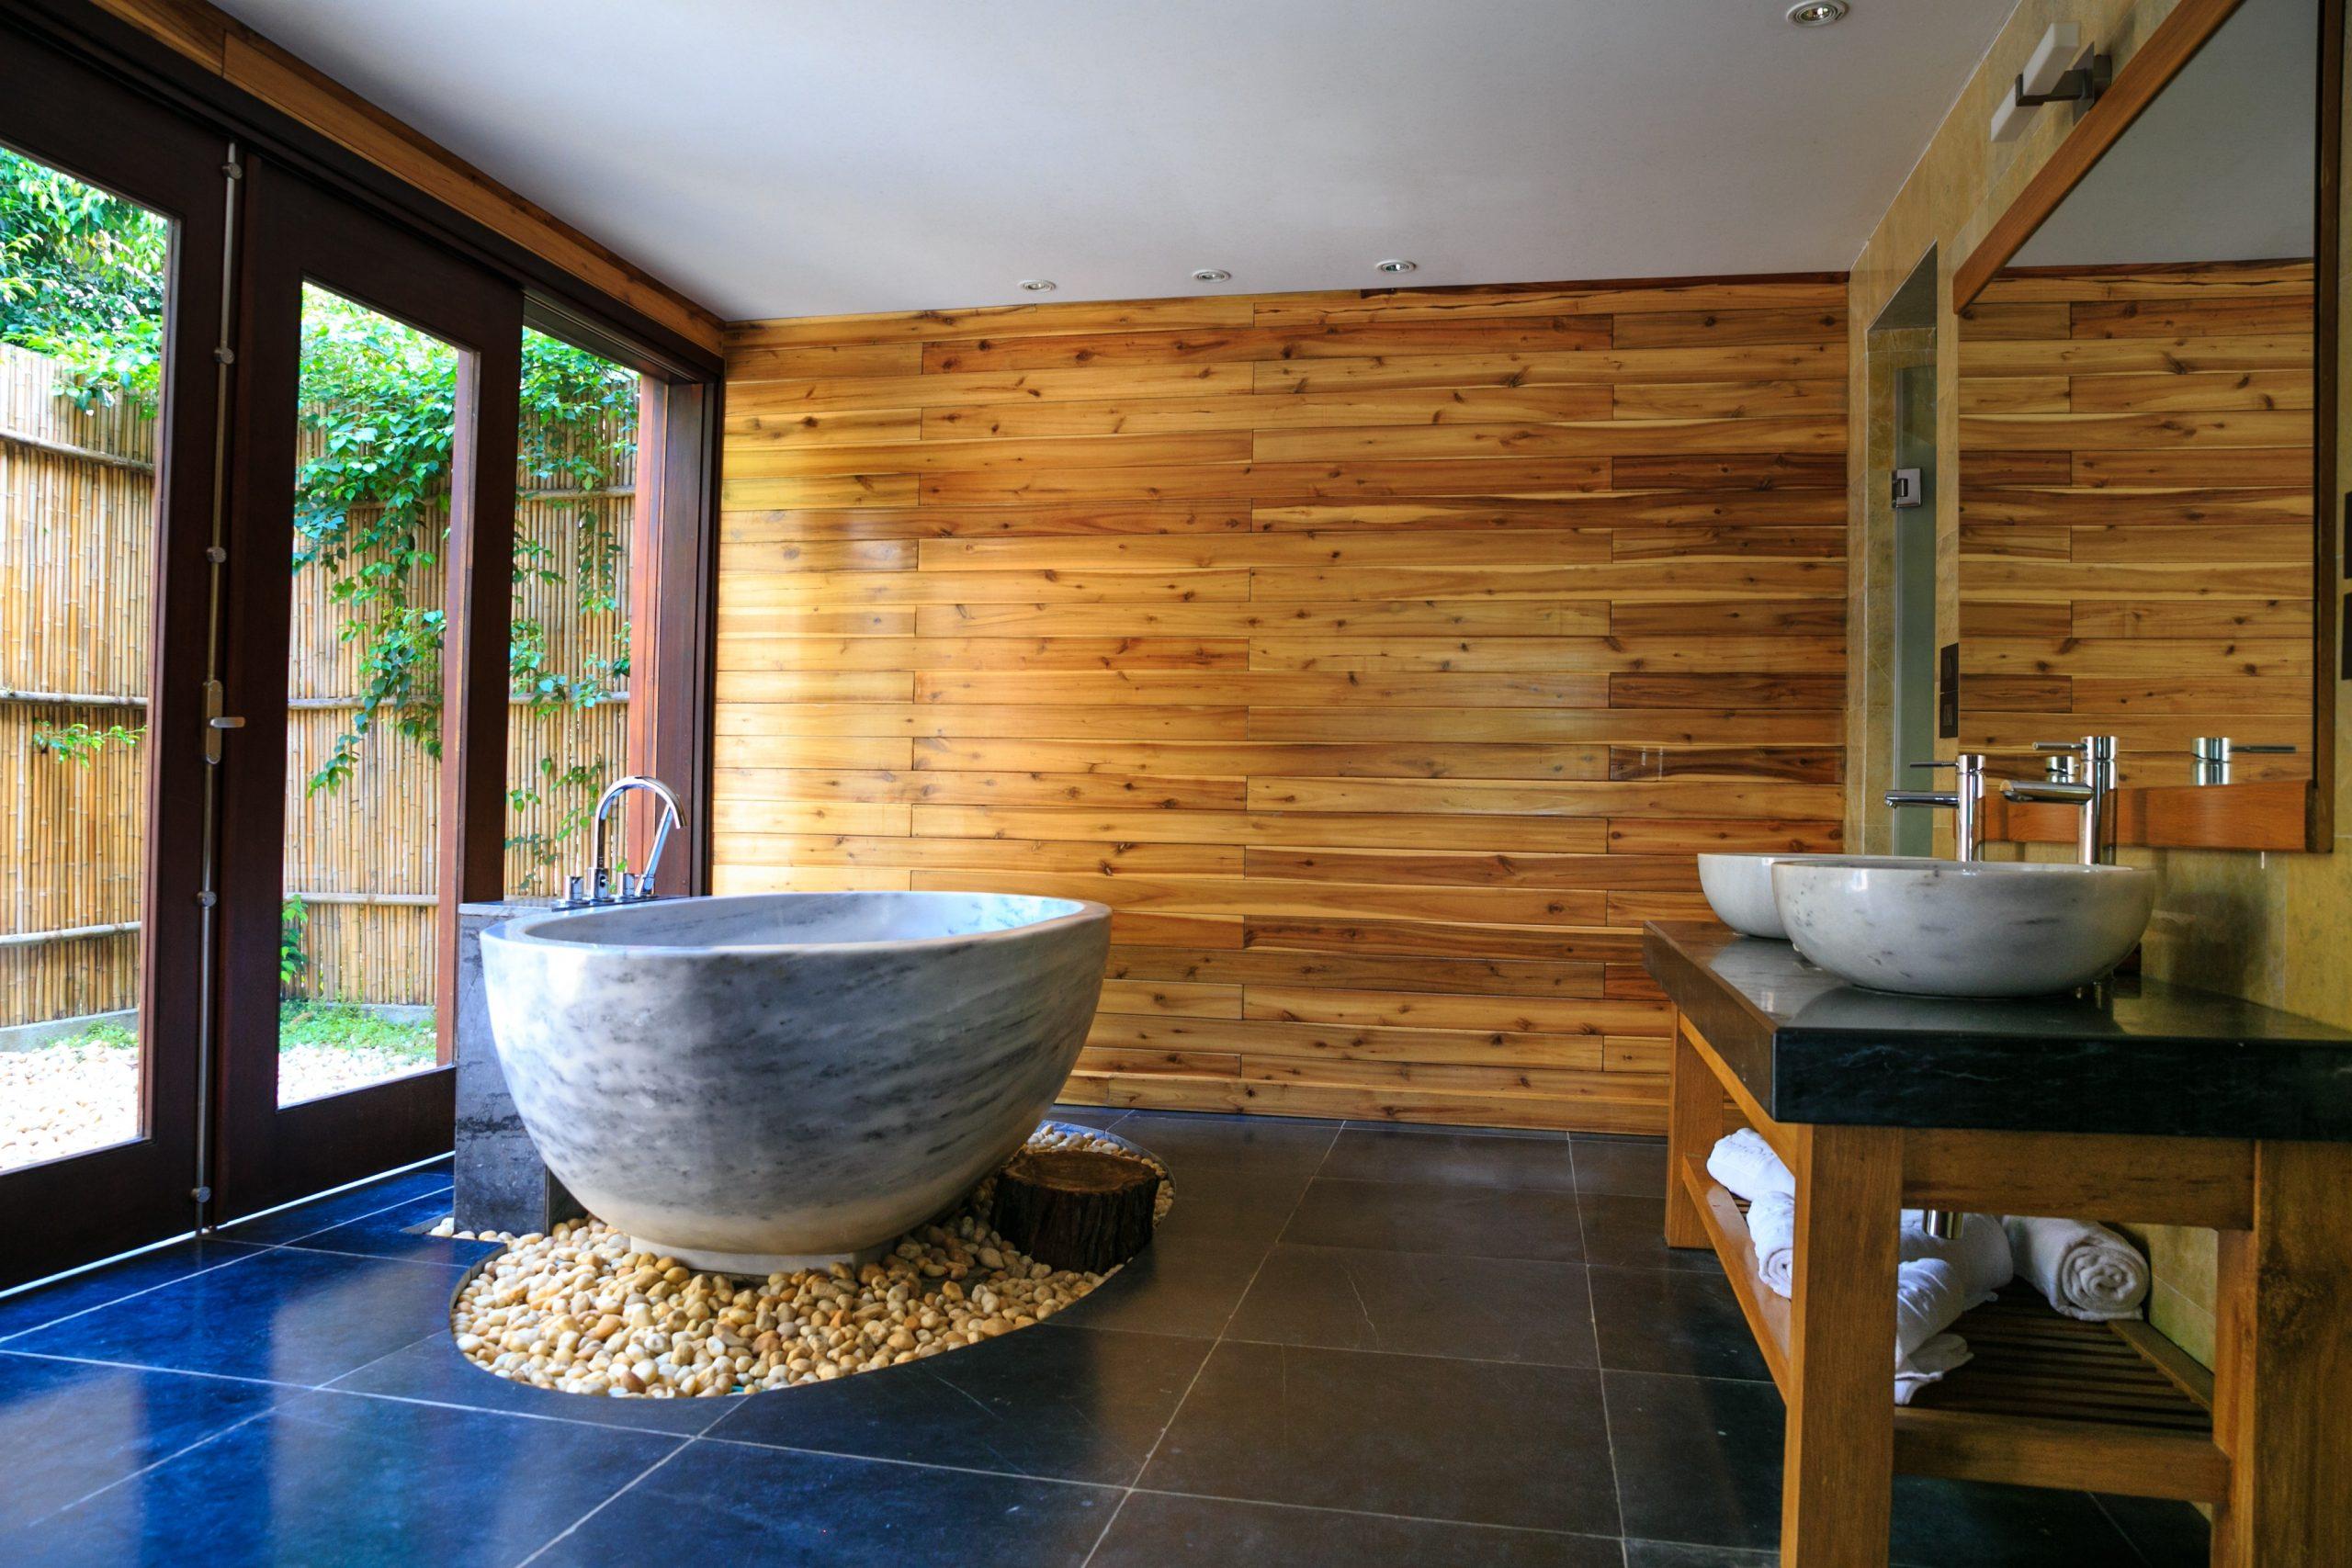 vannitoa ehitus